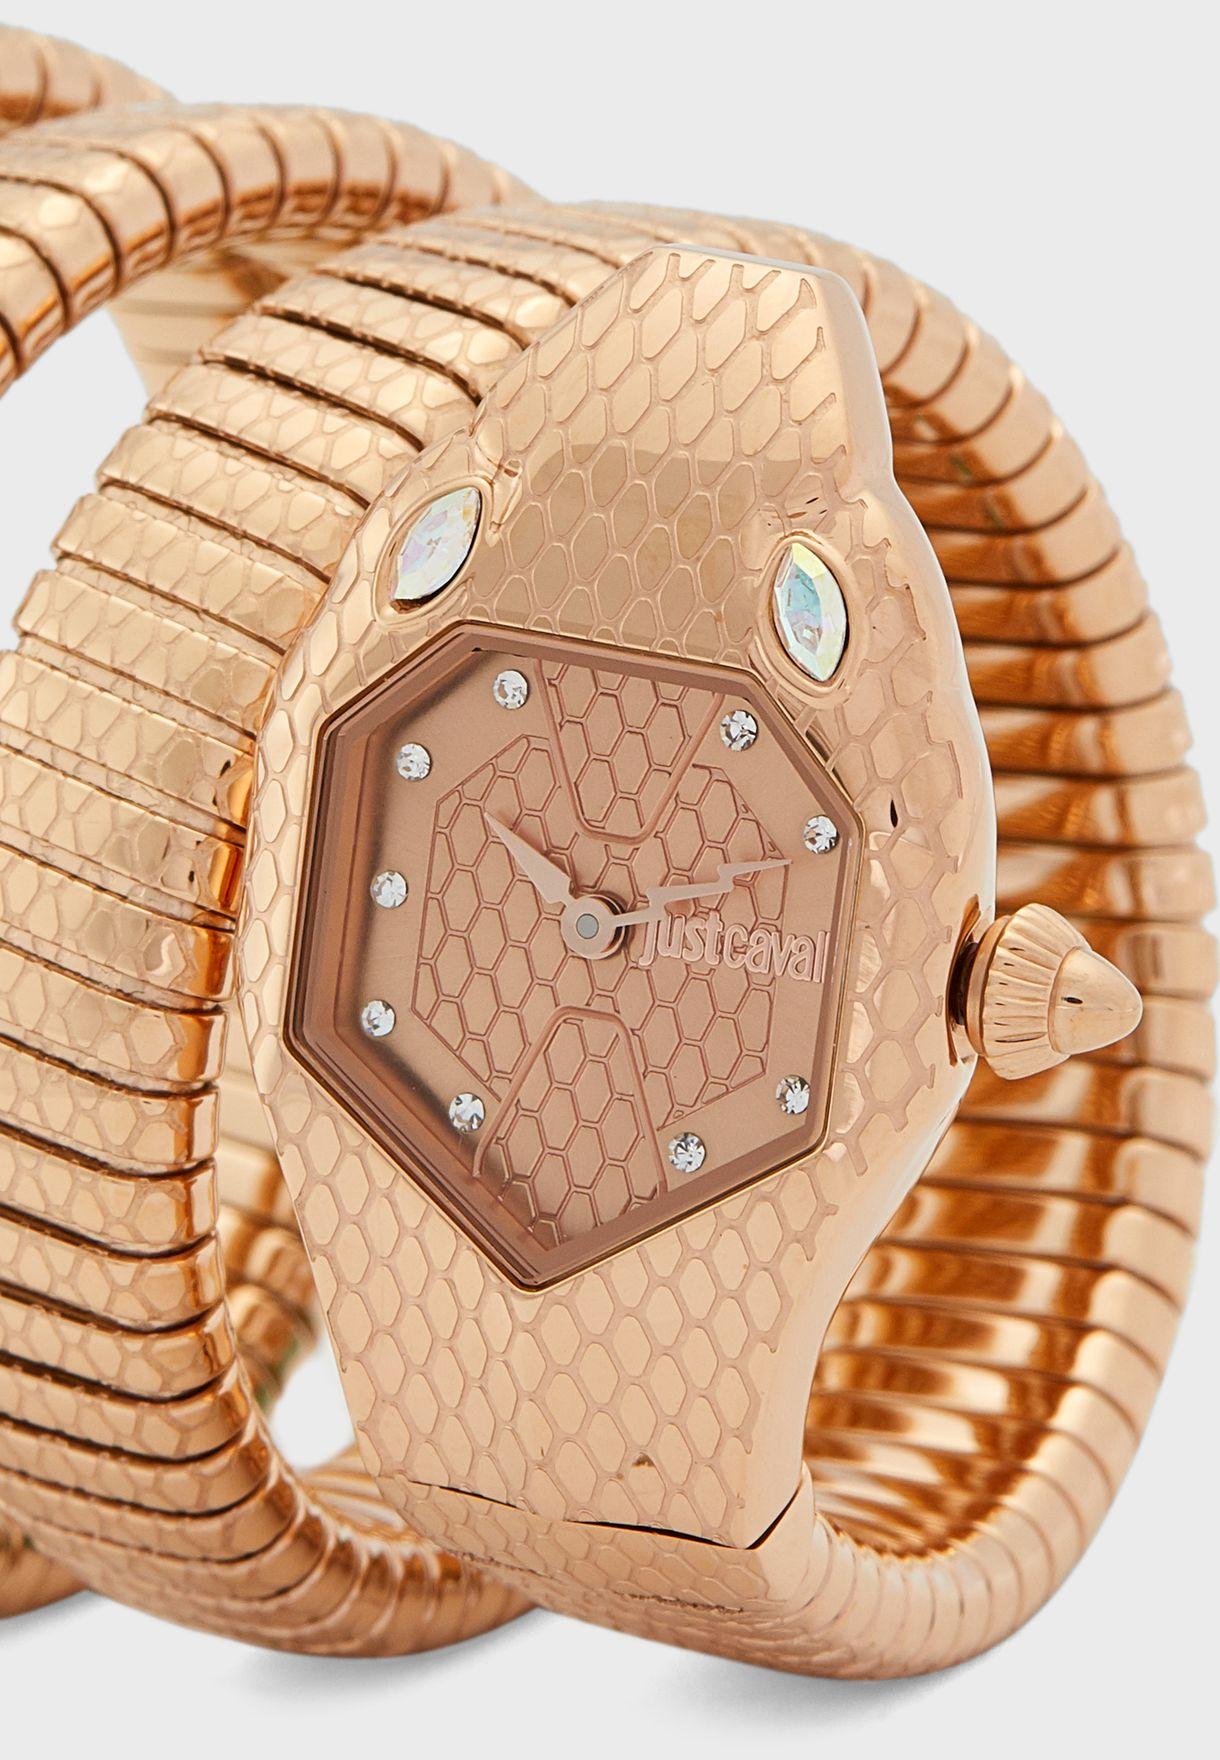 Jc1L168M0055 Analog Watche